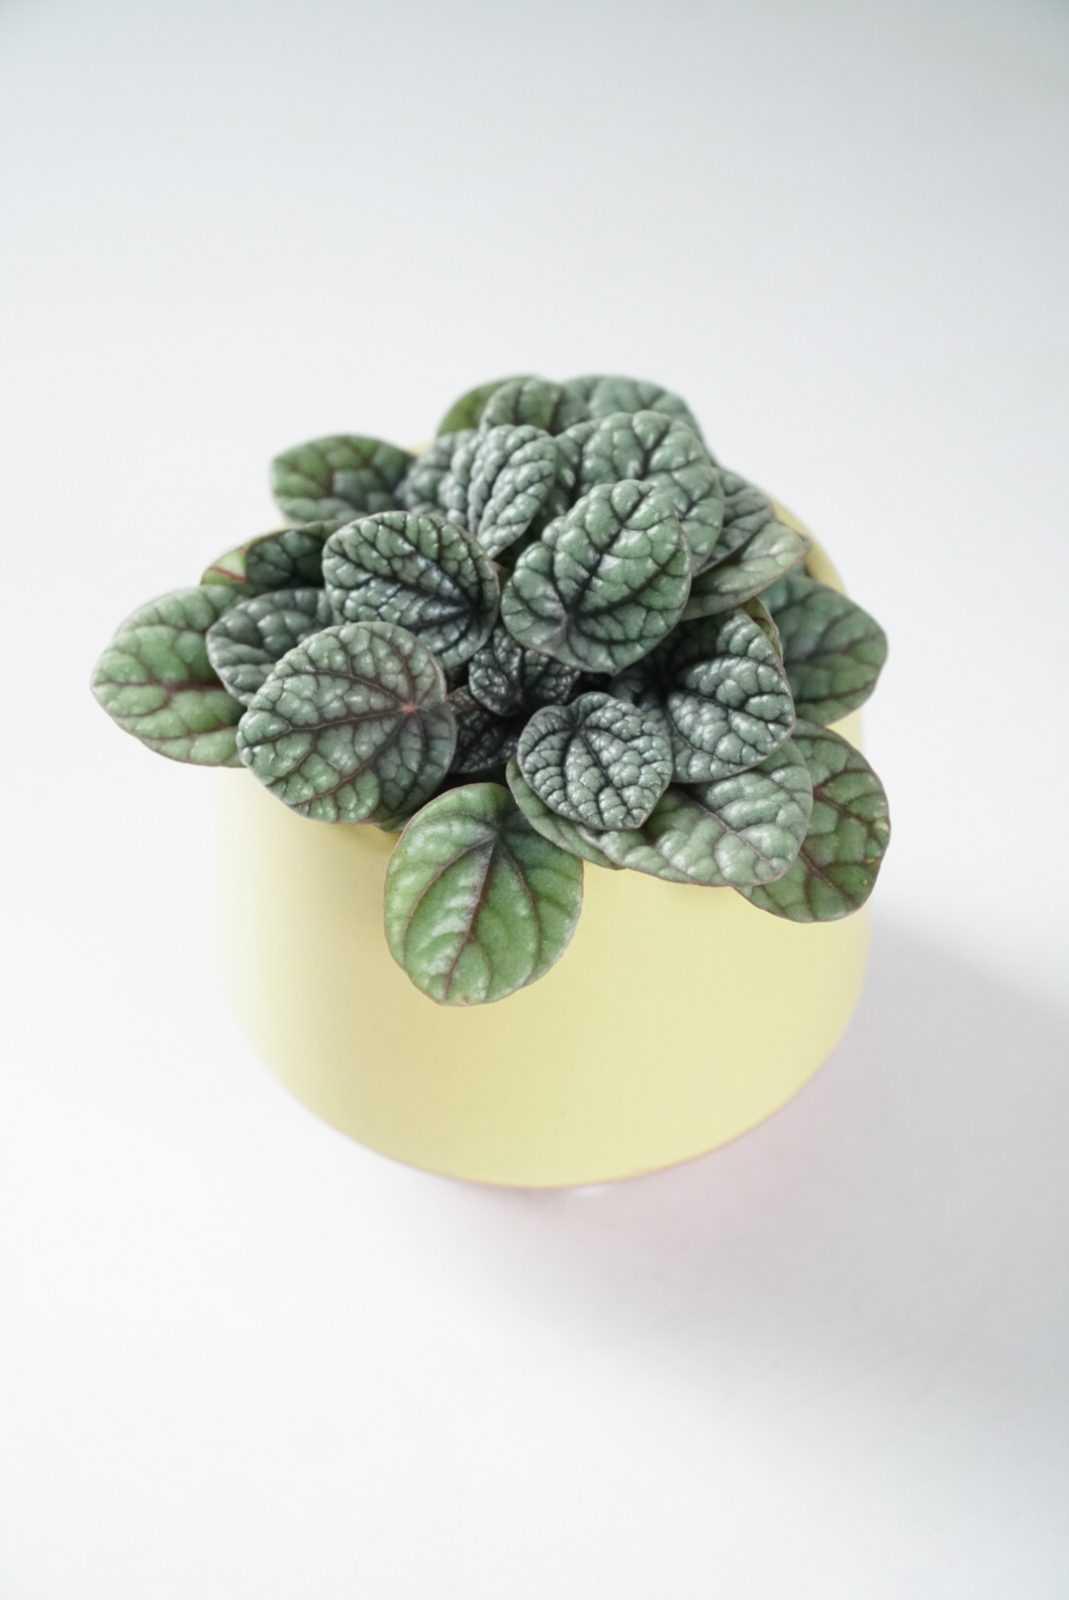 Peperomia 'Emerald Ripple' mini-plant buitenplant kamerplant plant plantje stek stekje terracotta pot potje glas glaasje